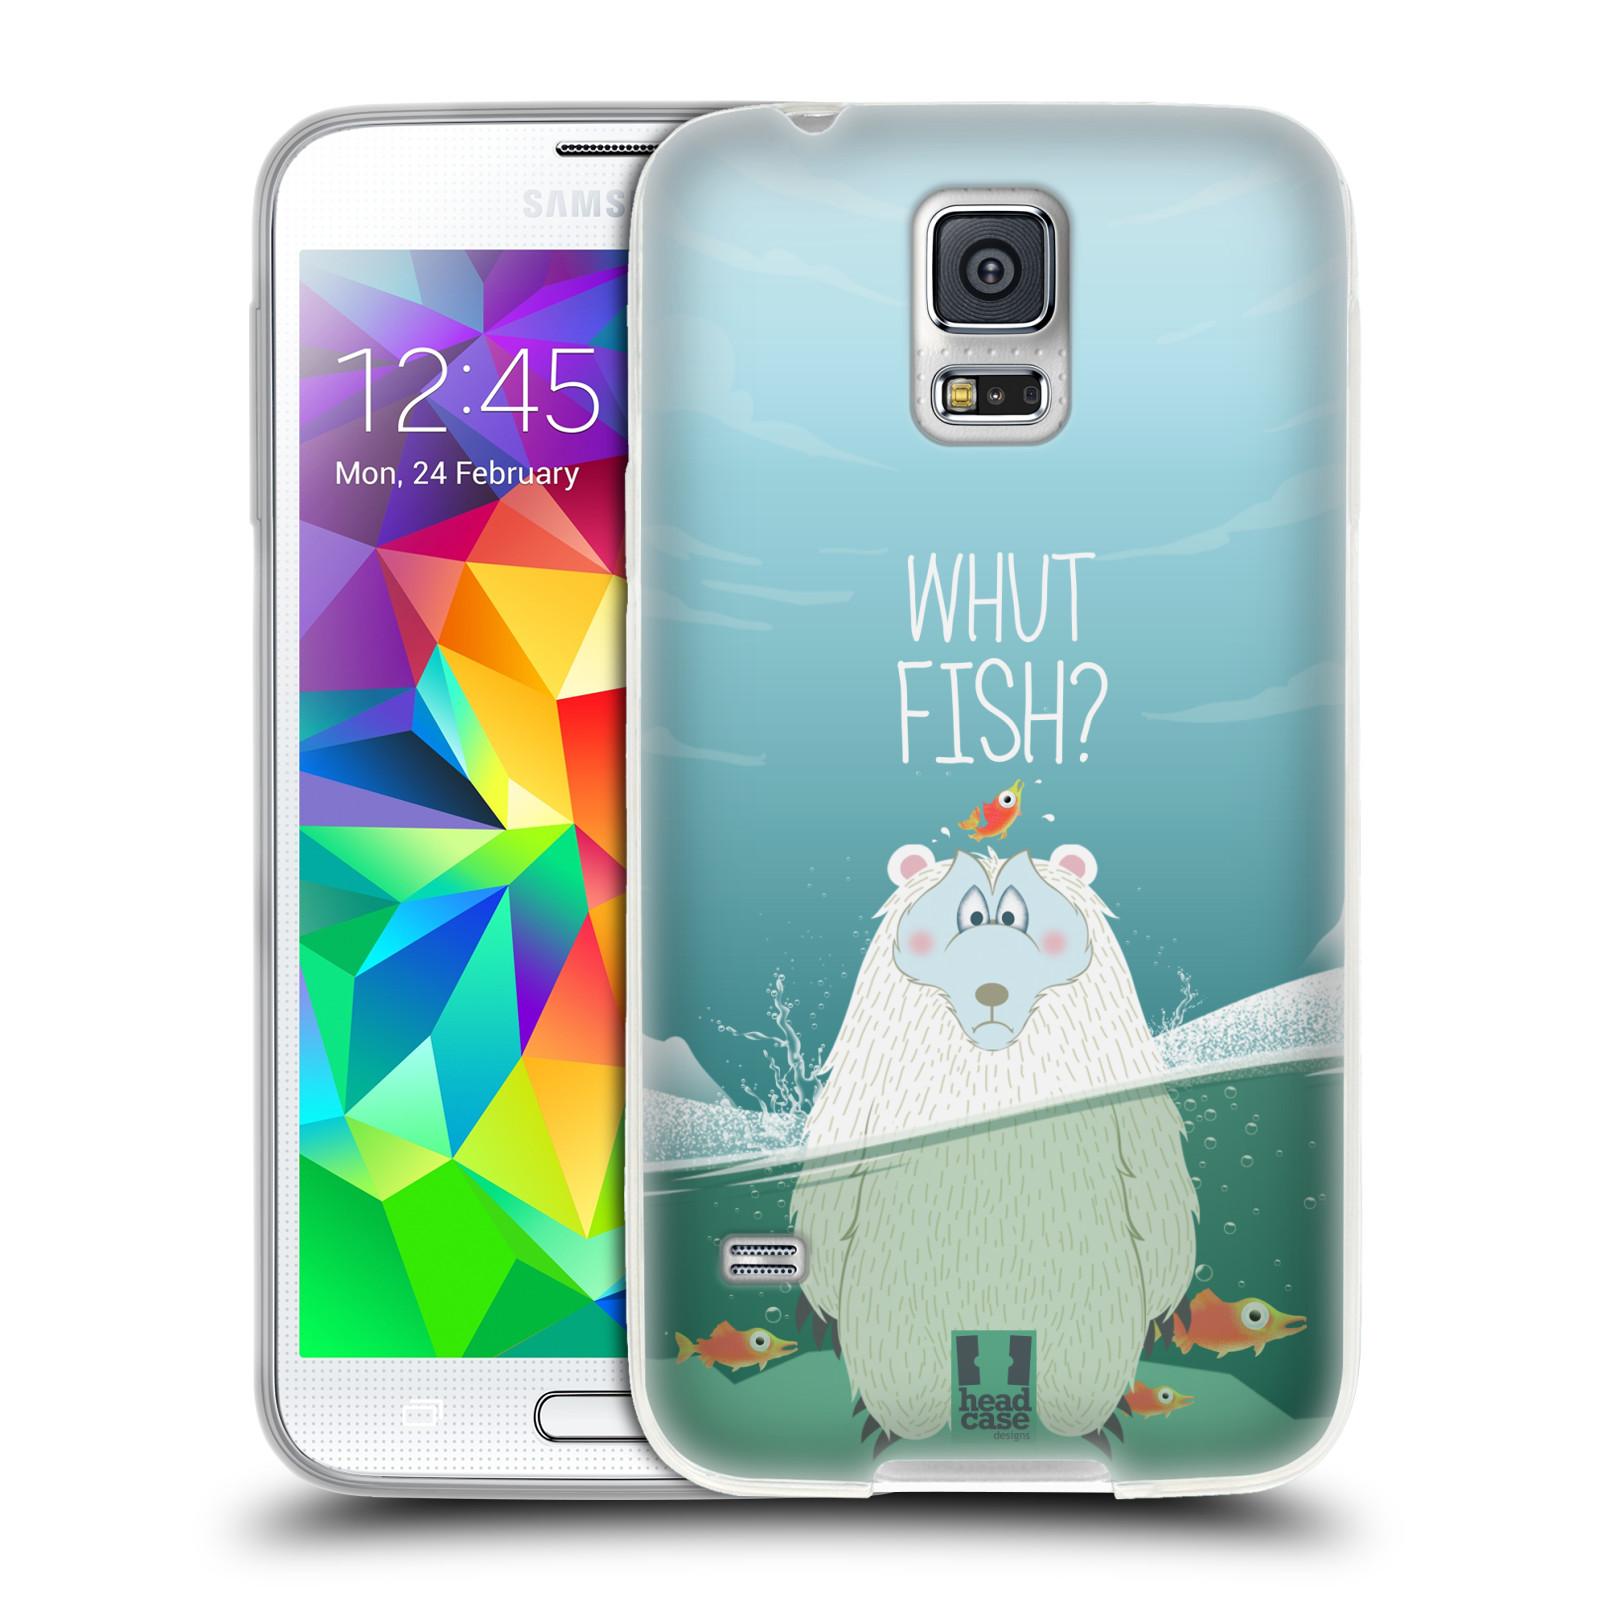 Silikonové pouzdro na mobil Samsung Galaxy S5 HEAD CASE Medvěd Whut Fish?